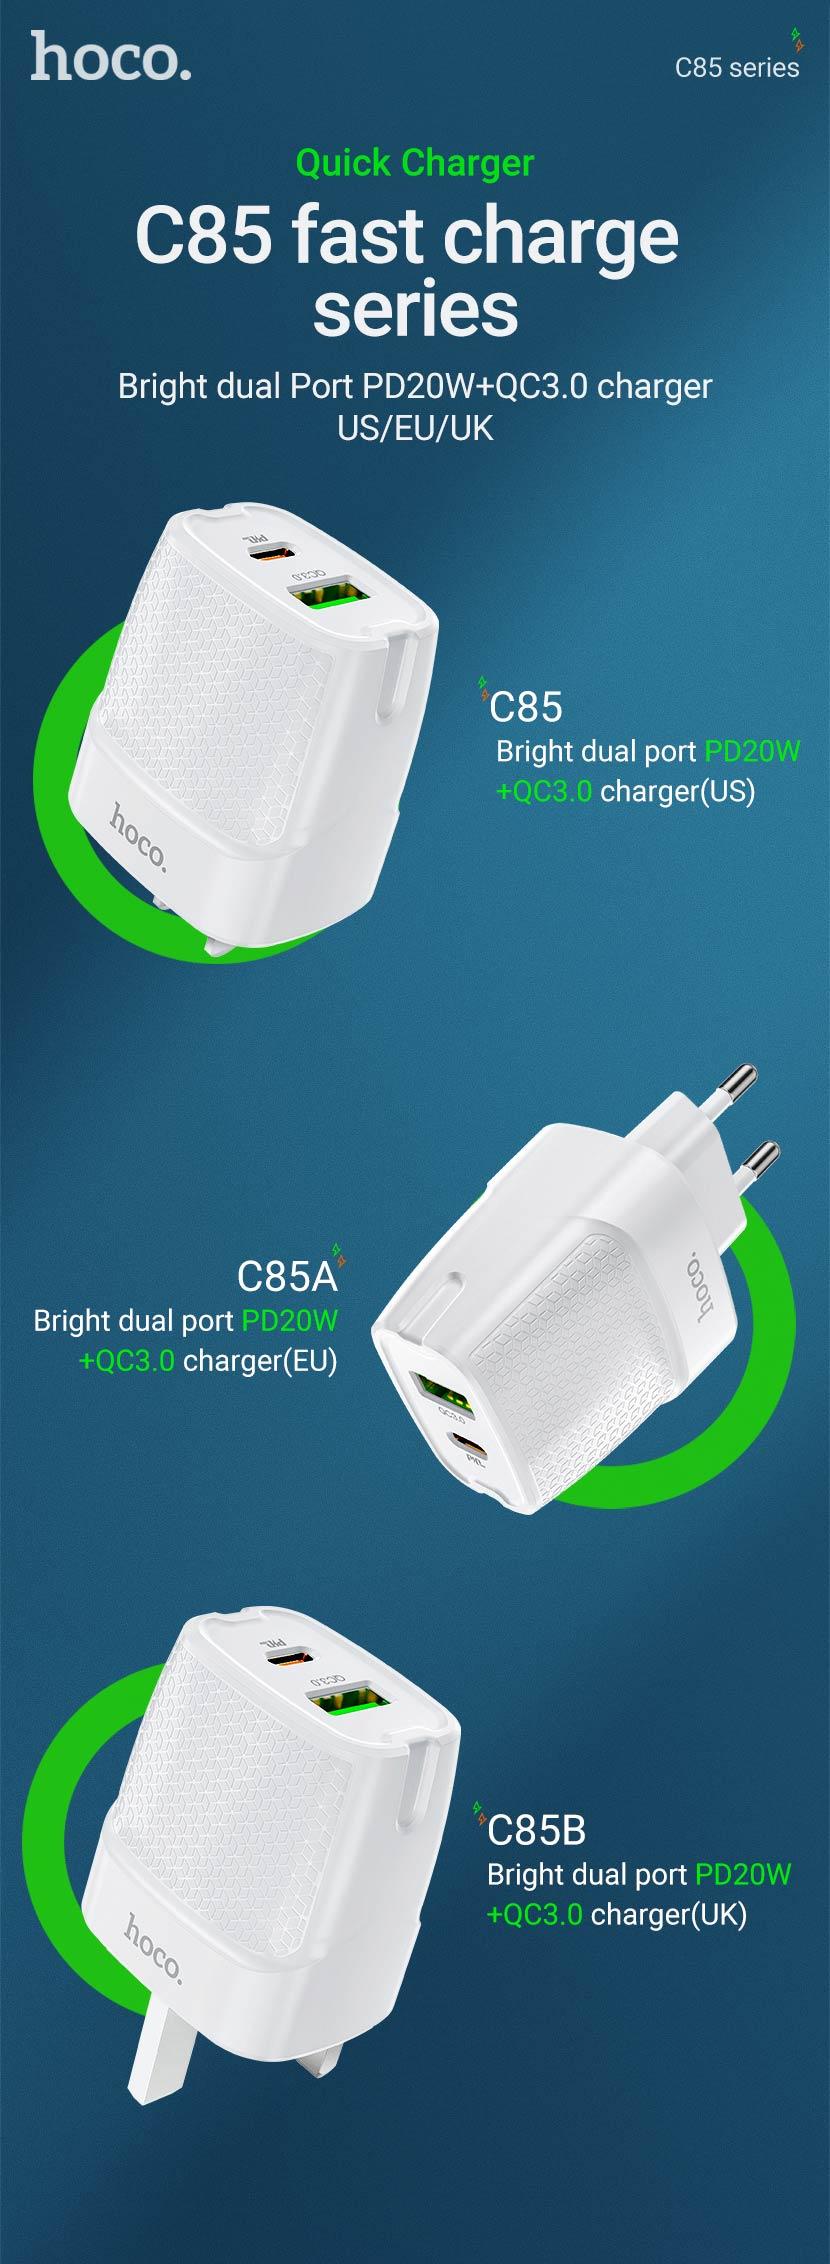 hoco news c85 bright dual port pd20w qc3 wall charger plugs en